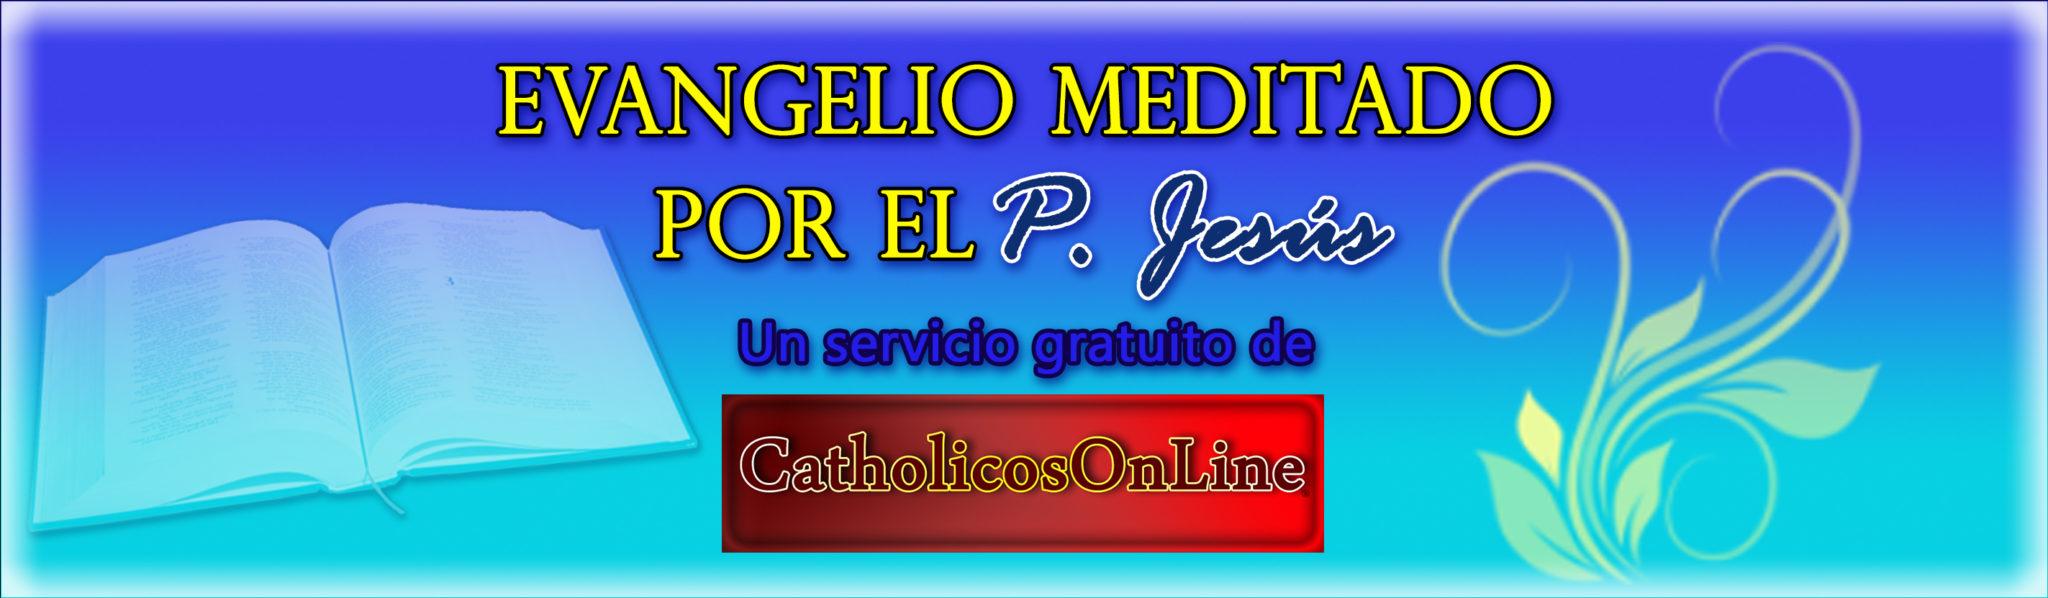 Evangelio del día – CatholicosOnLine